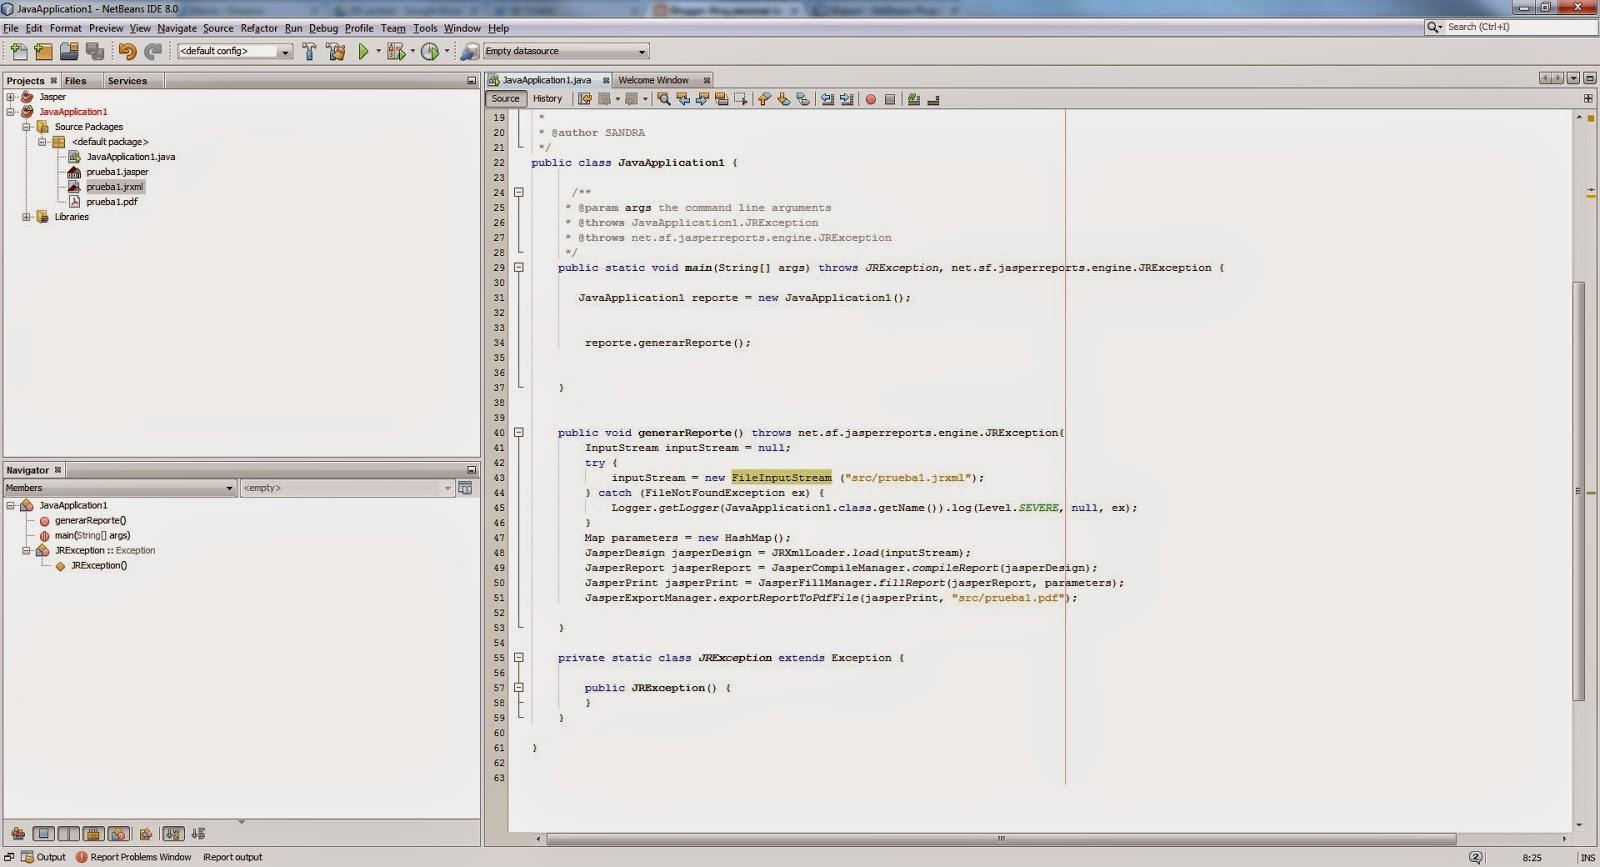 netbeans 8.0 tutorial pdf